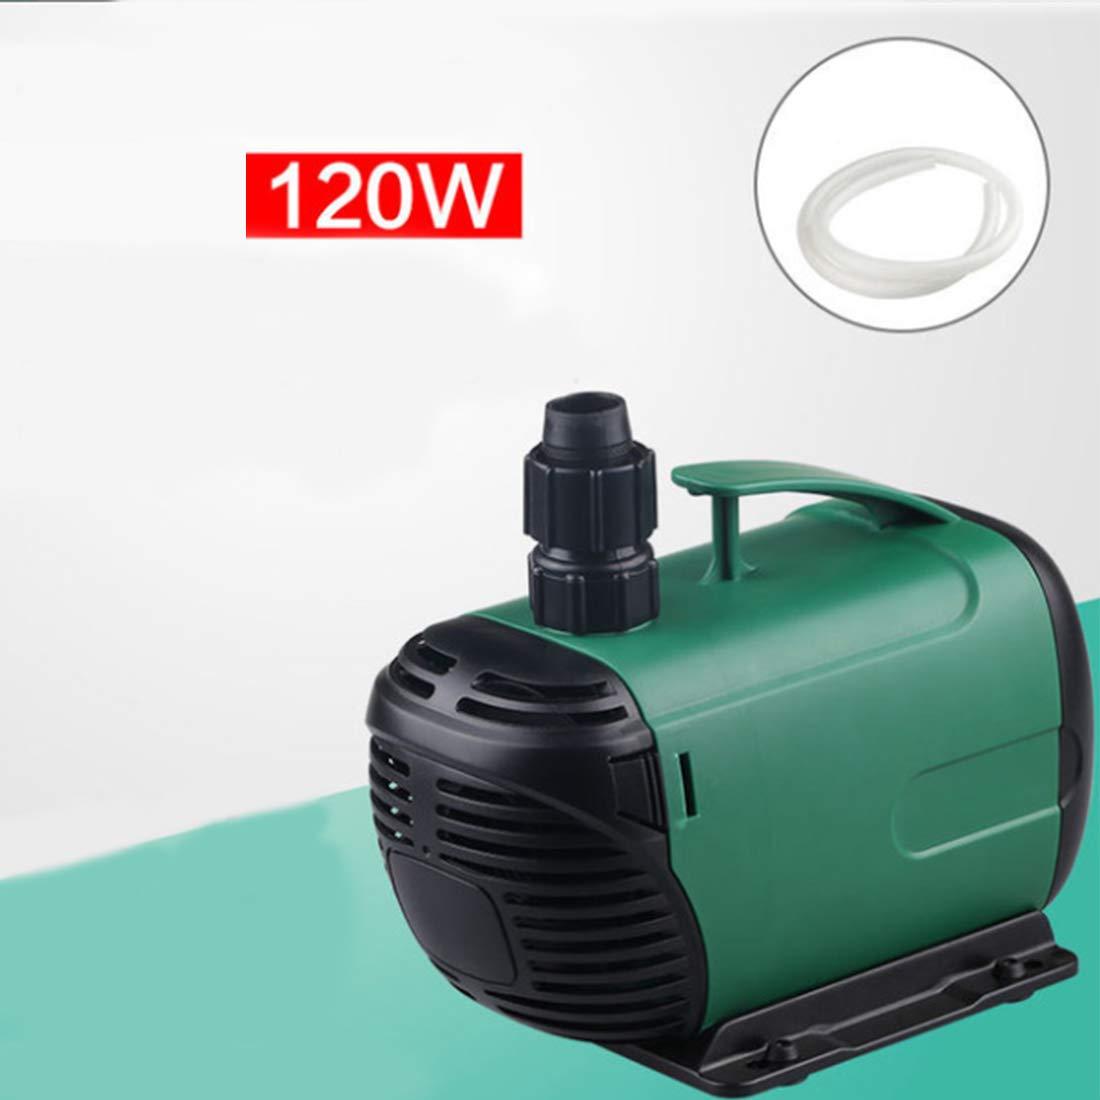 120W FELICIPP Submersible Pump 1400L-6800L Hr, Fountain Water Pump for Fish Tank, Hydroponics,Aquarium (Wattage   120W)